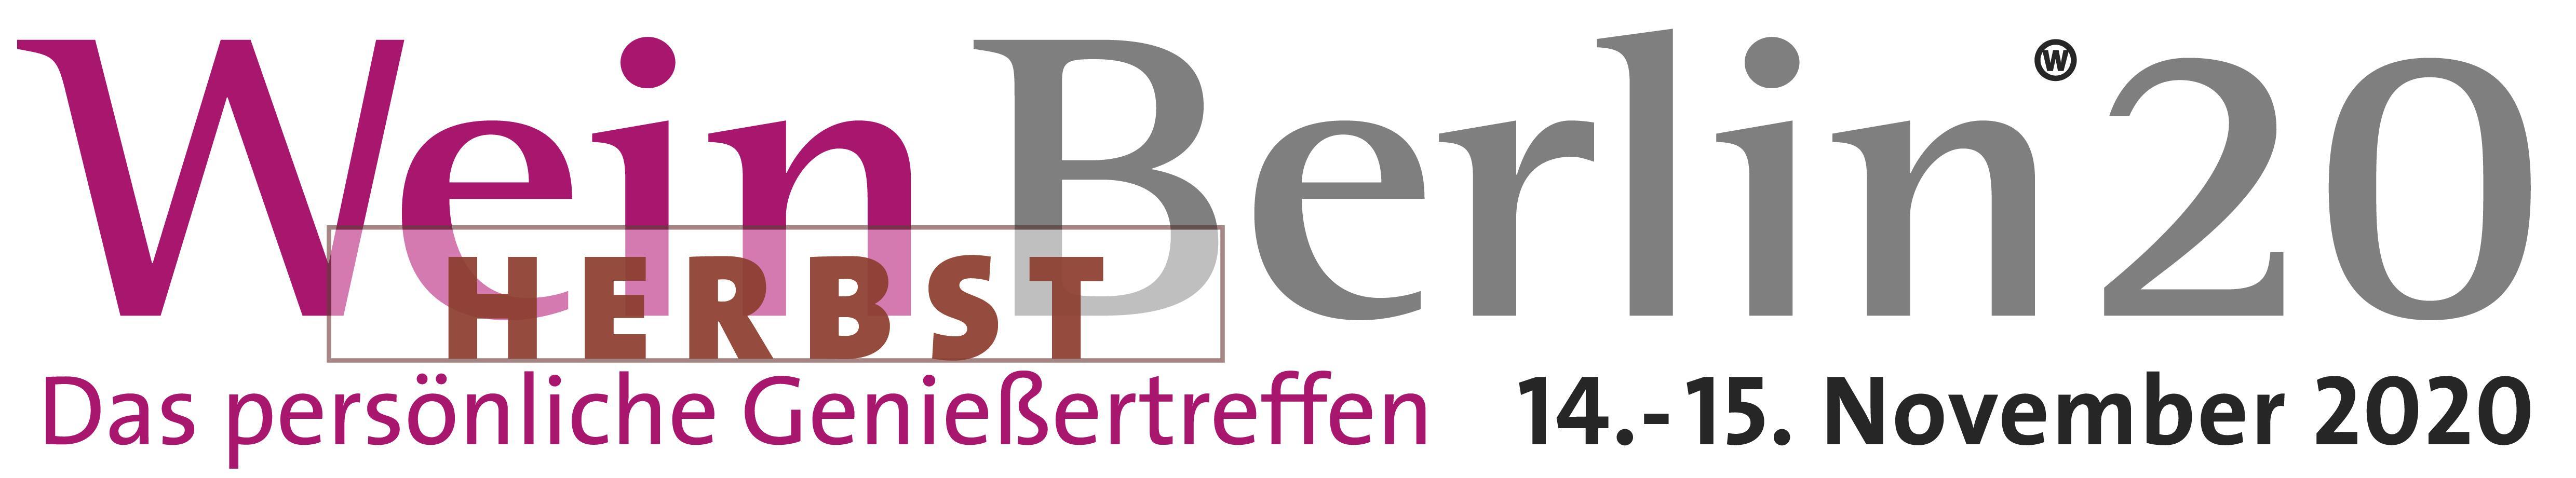 Wein Berlin